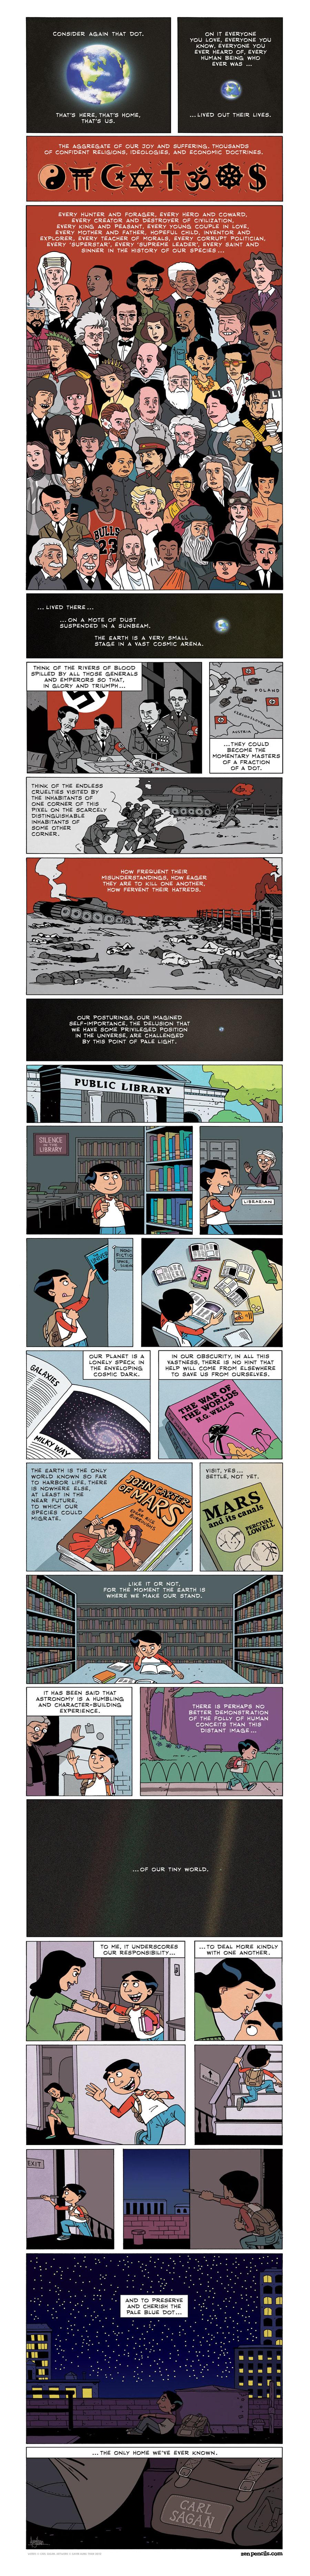 Zen Pencils Comic Strip for February 17, 2014